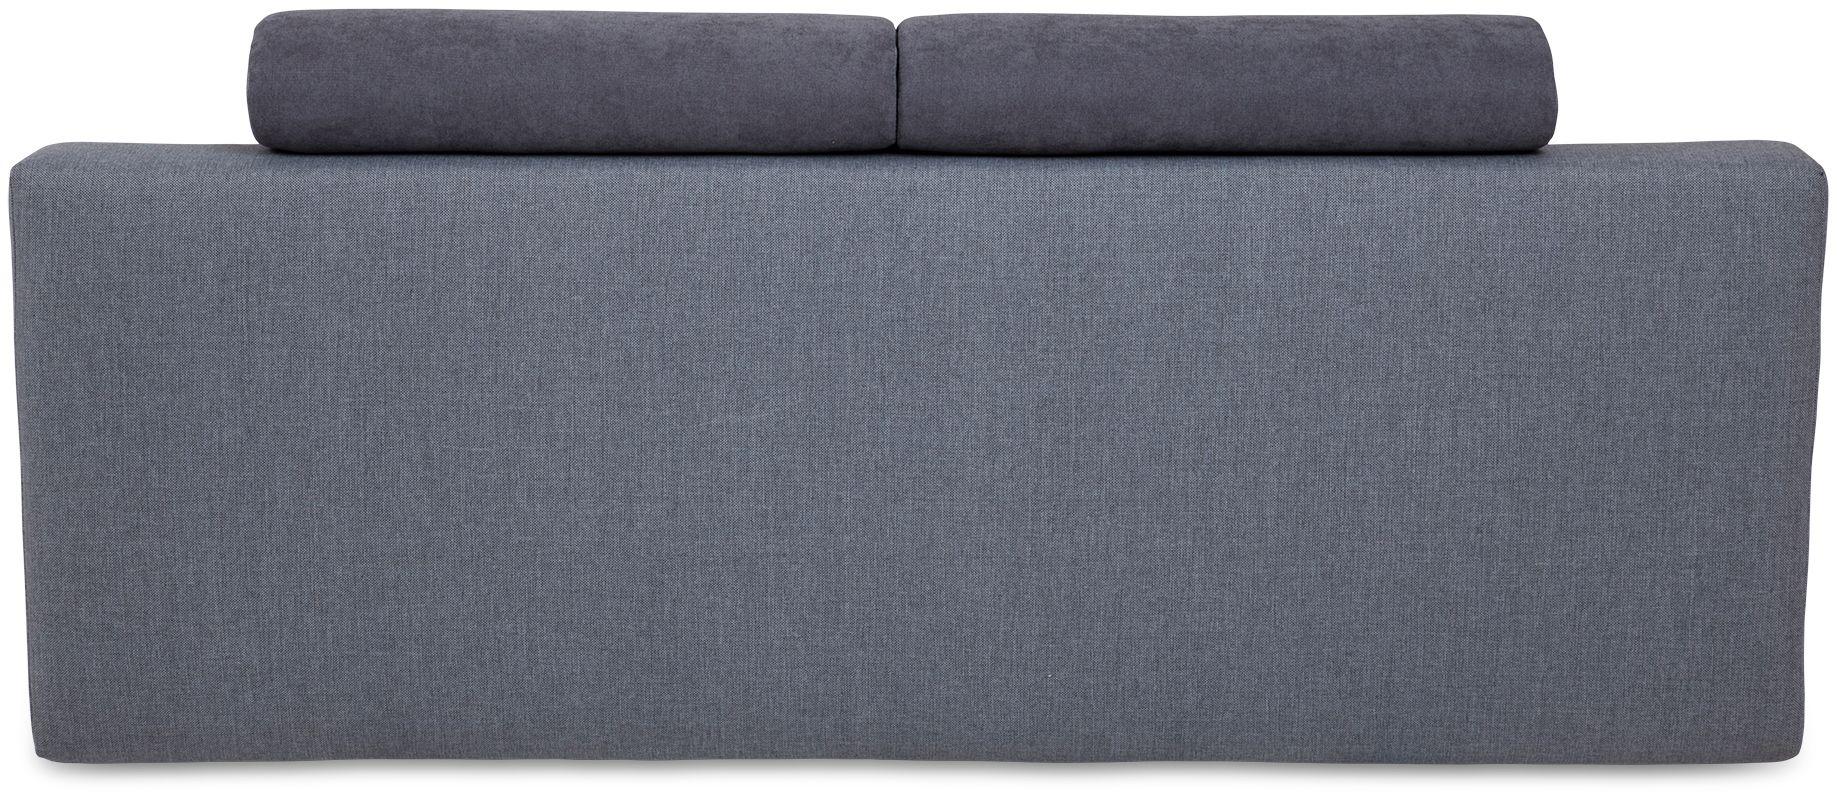 sofa sevia 10